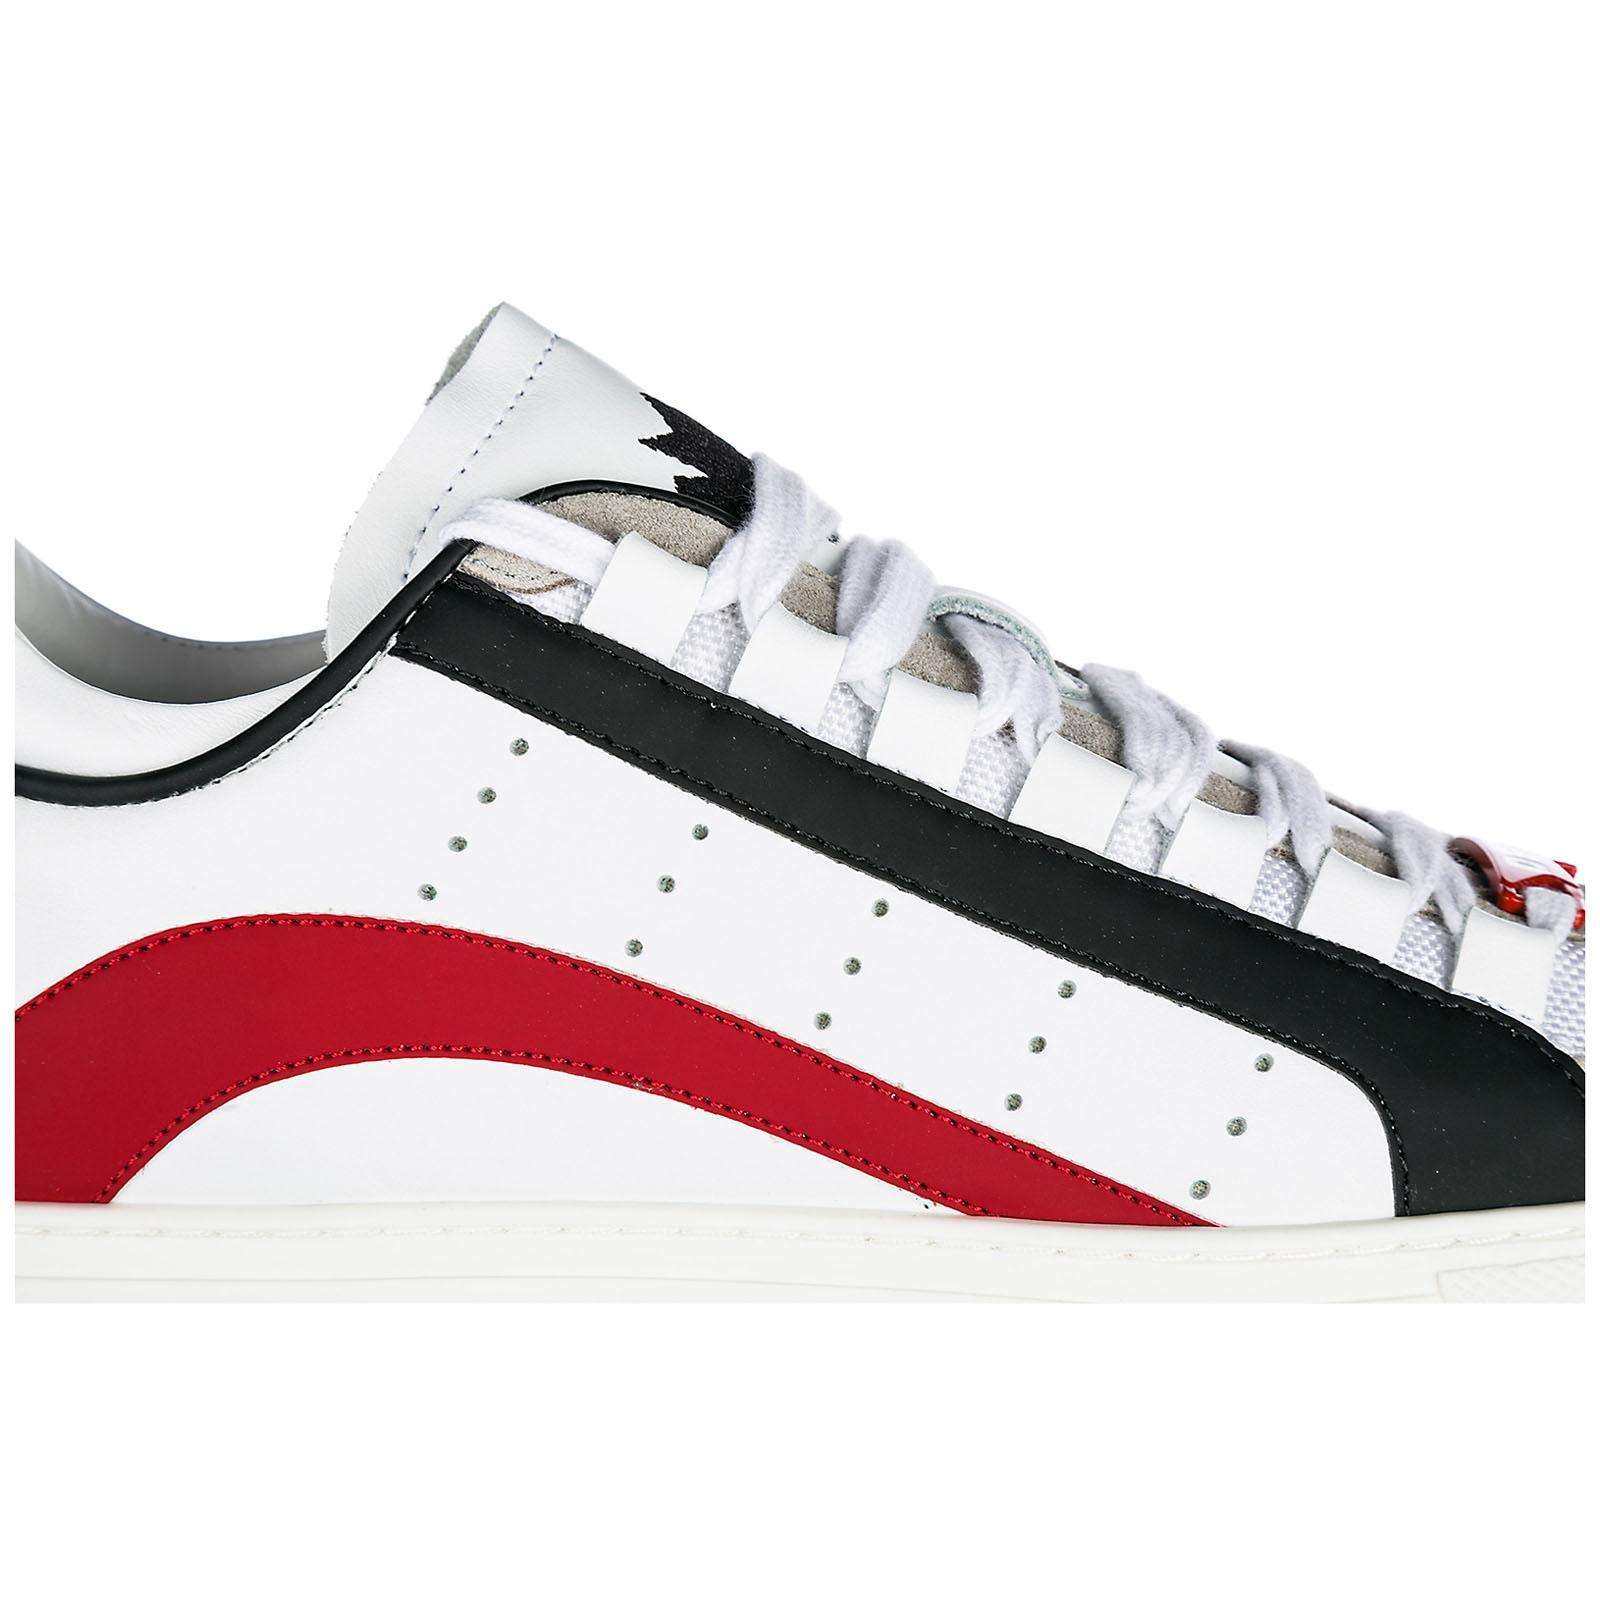 DSQUARED2 Sneakers Uomo Snm000611570001m244 Pelle Bianco dXpltusCLg